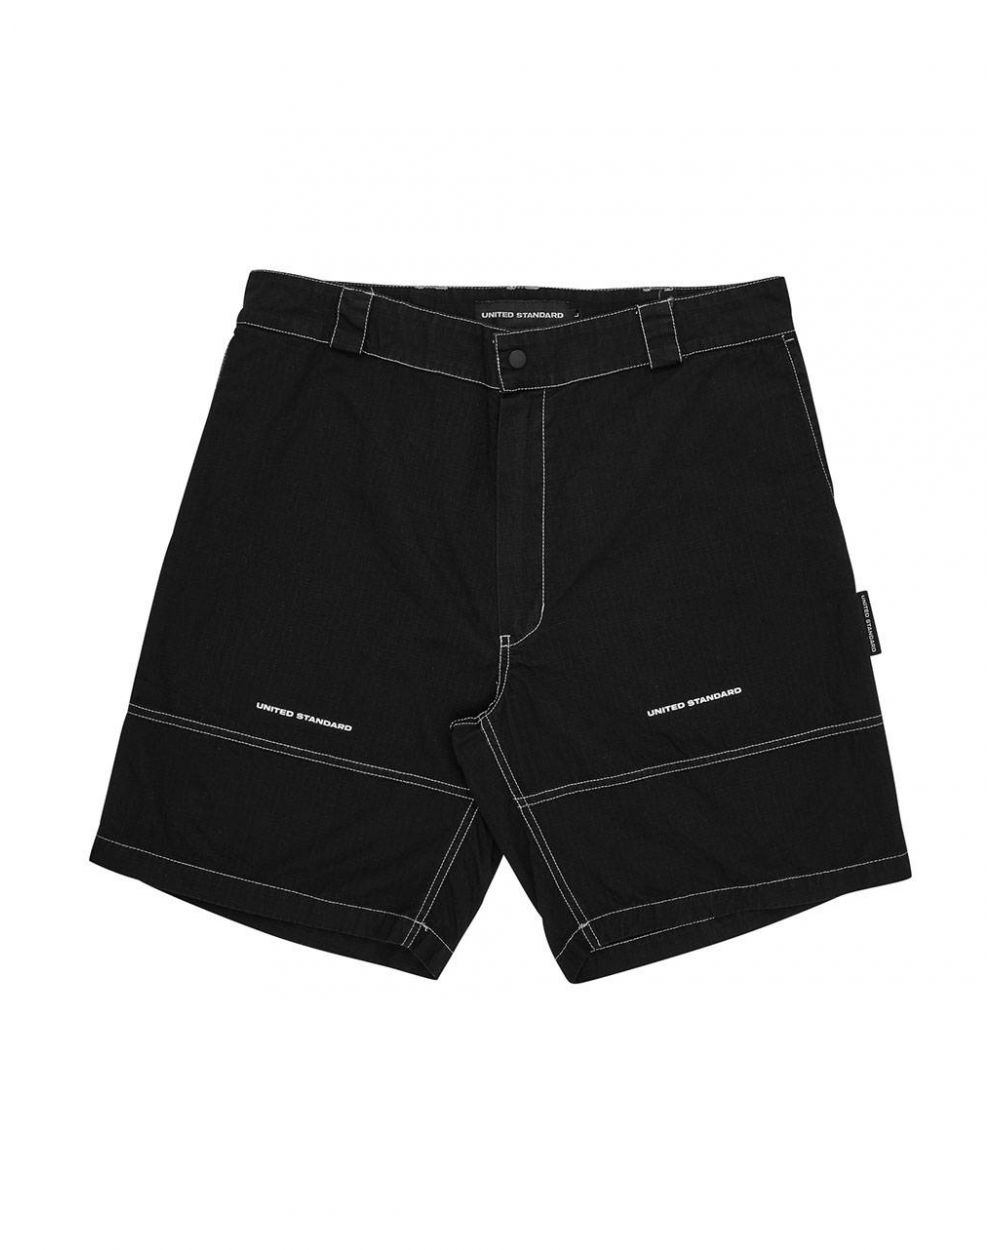 United Standard Mask shorts - black United Standard Shorts 154,92€